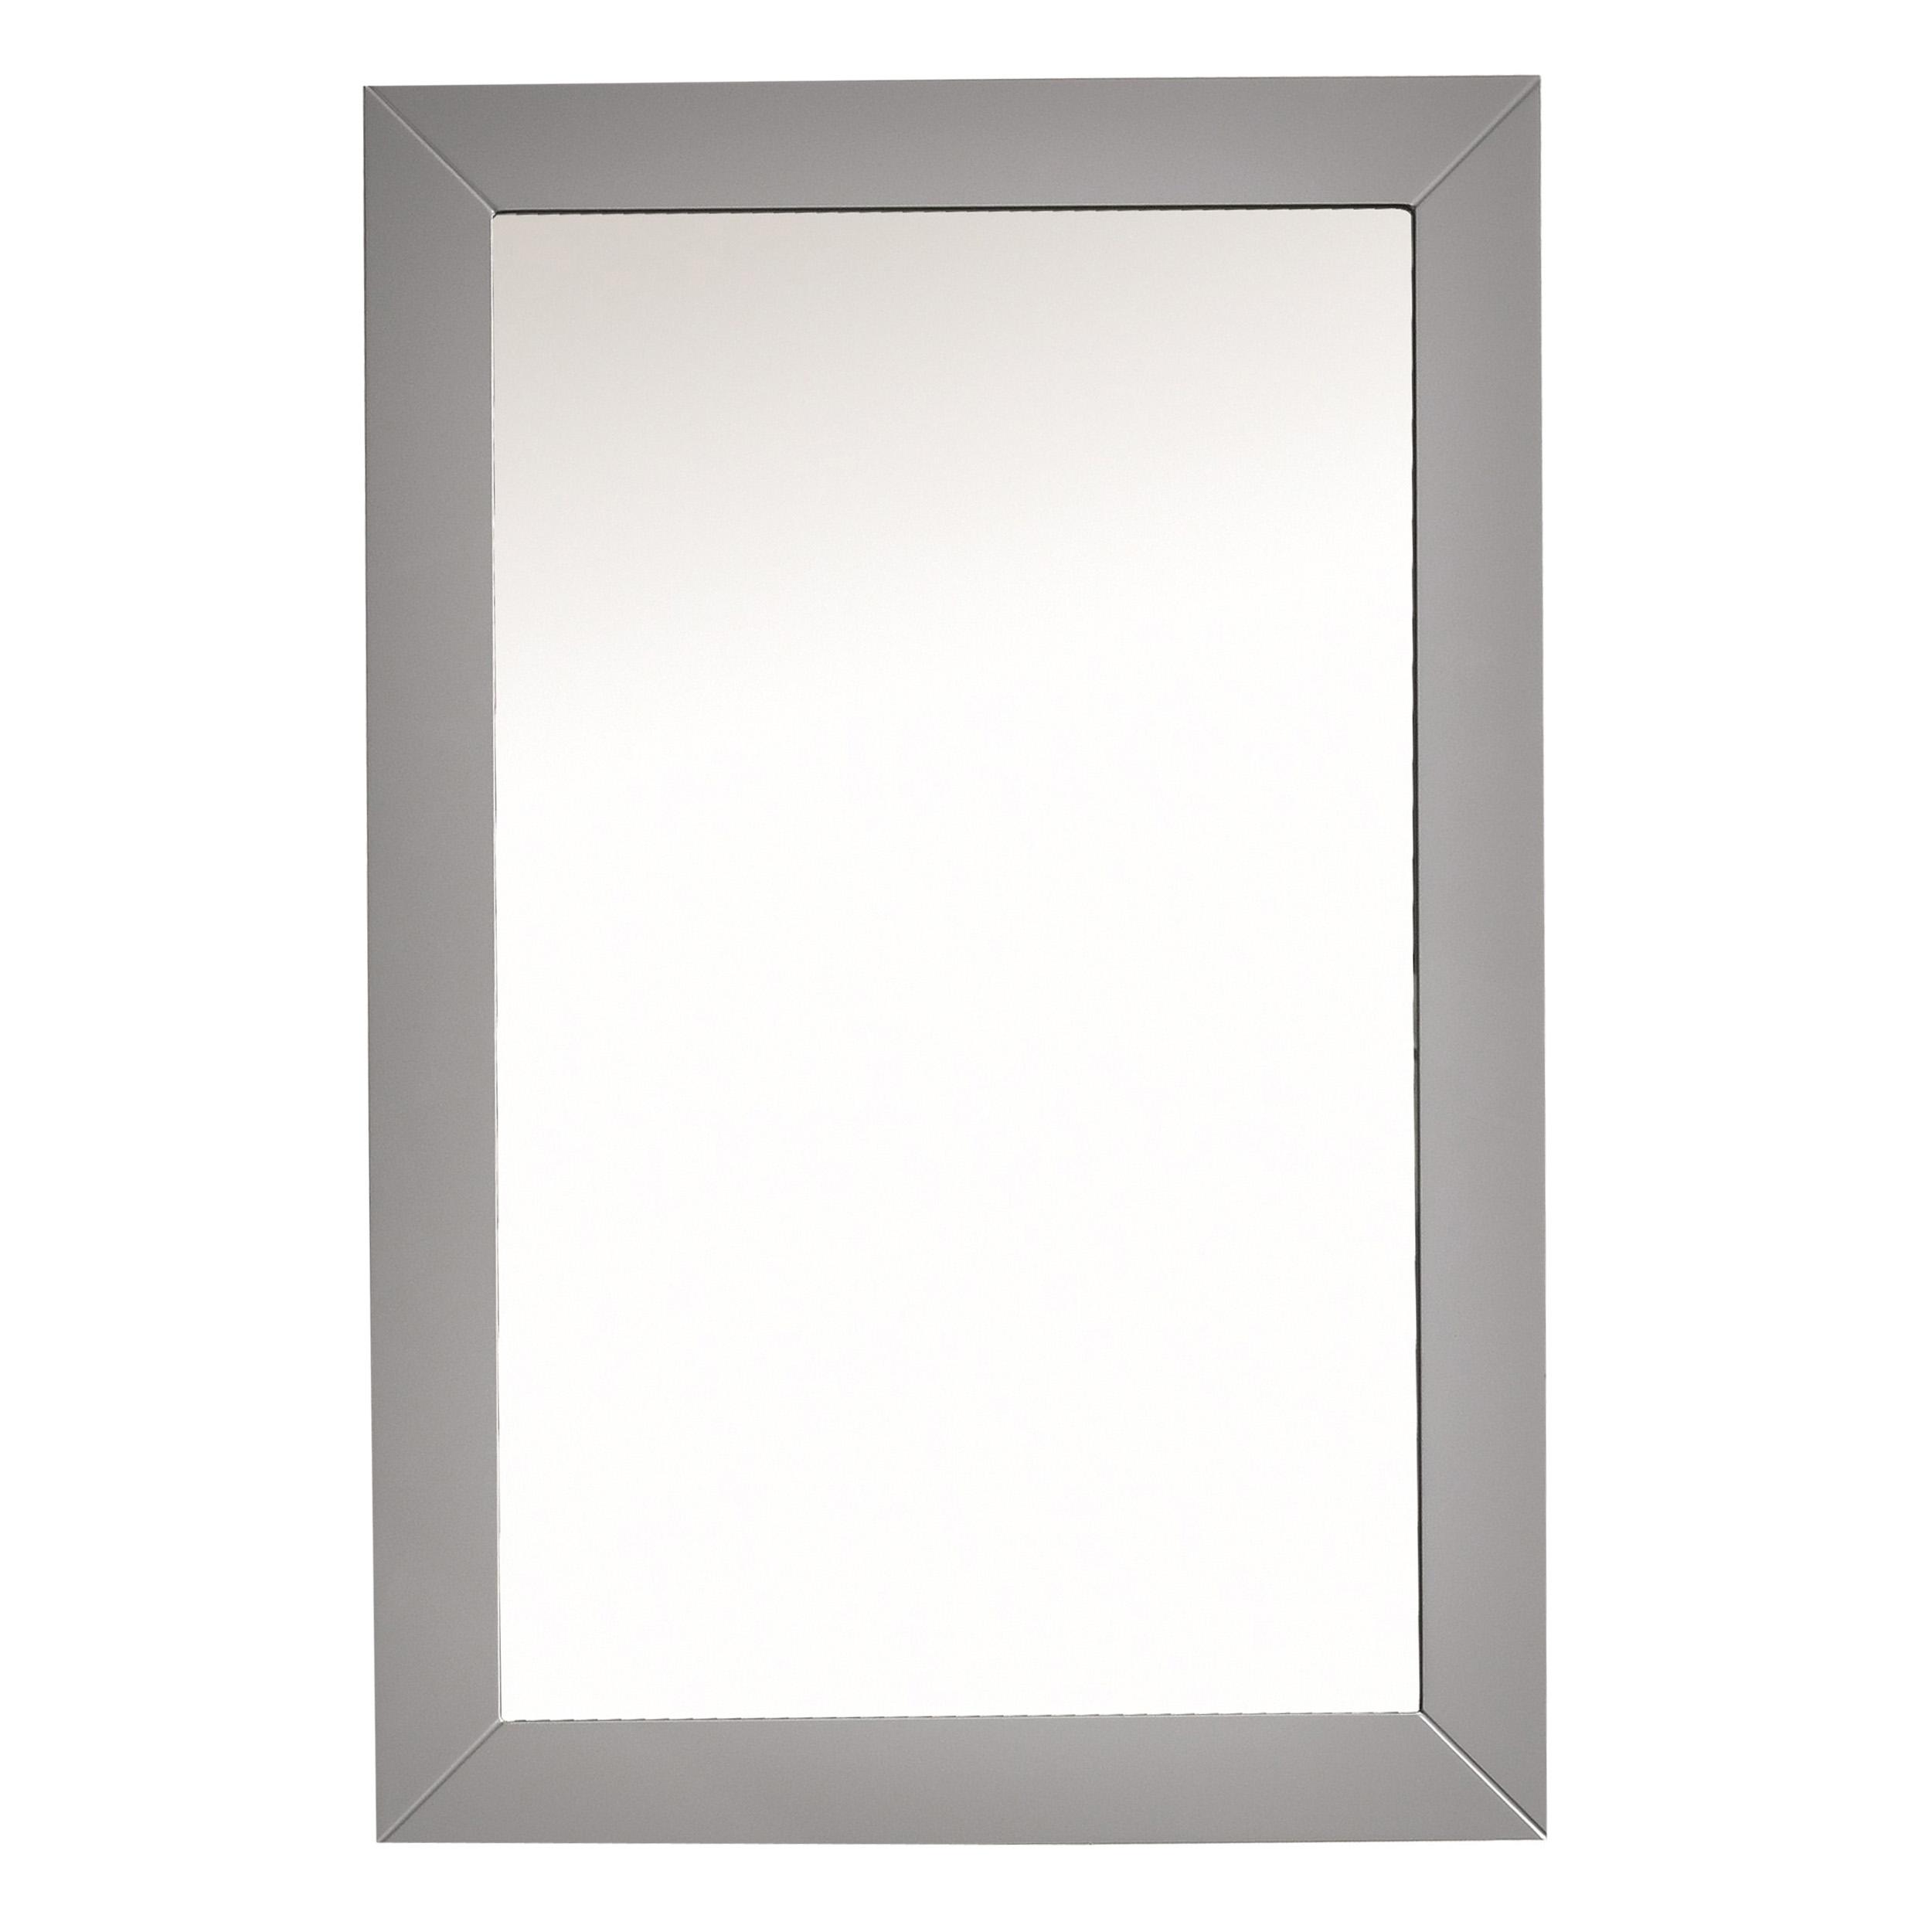 EVMR69 30GR A Main - Eviva Acclaim Transitional Grey Bathroom Vanity Mirror